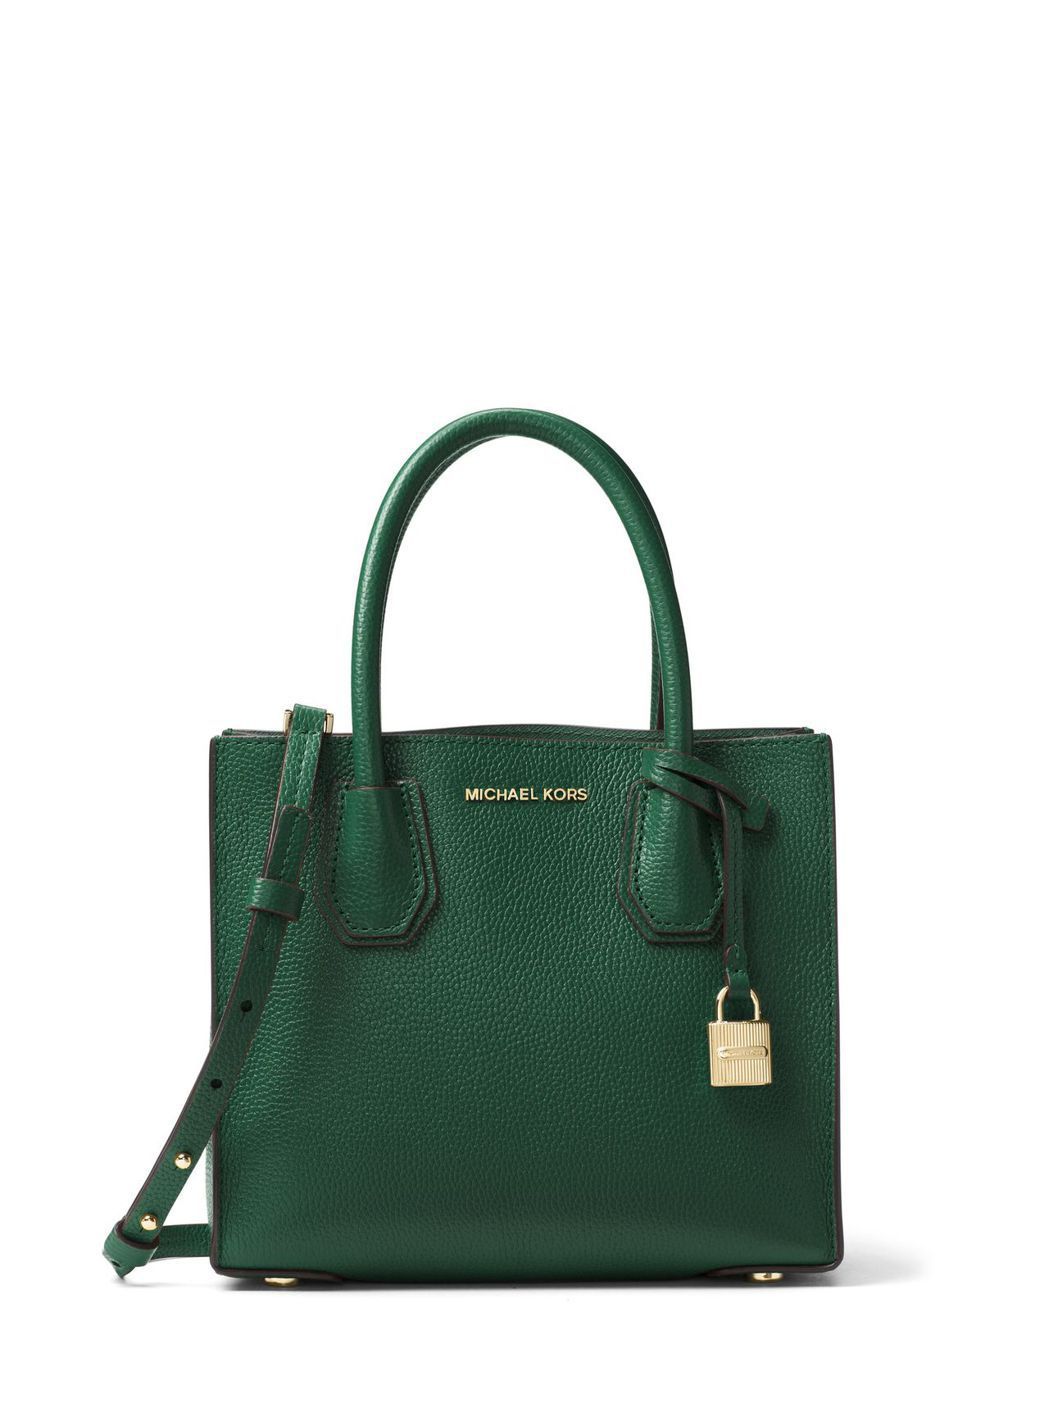 Mercer鮮綠色小方包,售價12,400元。圖/MICHAEL KORS提供